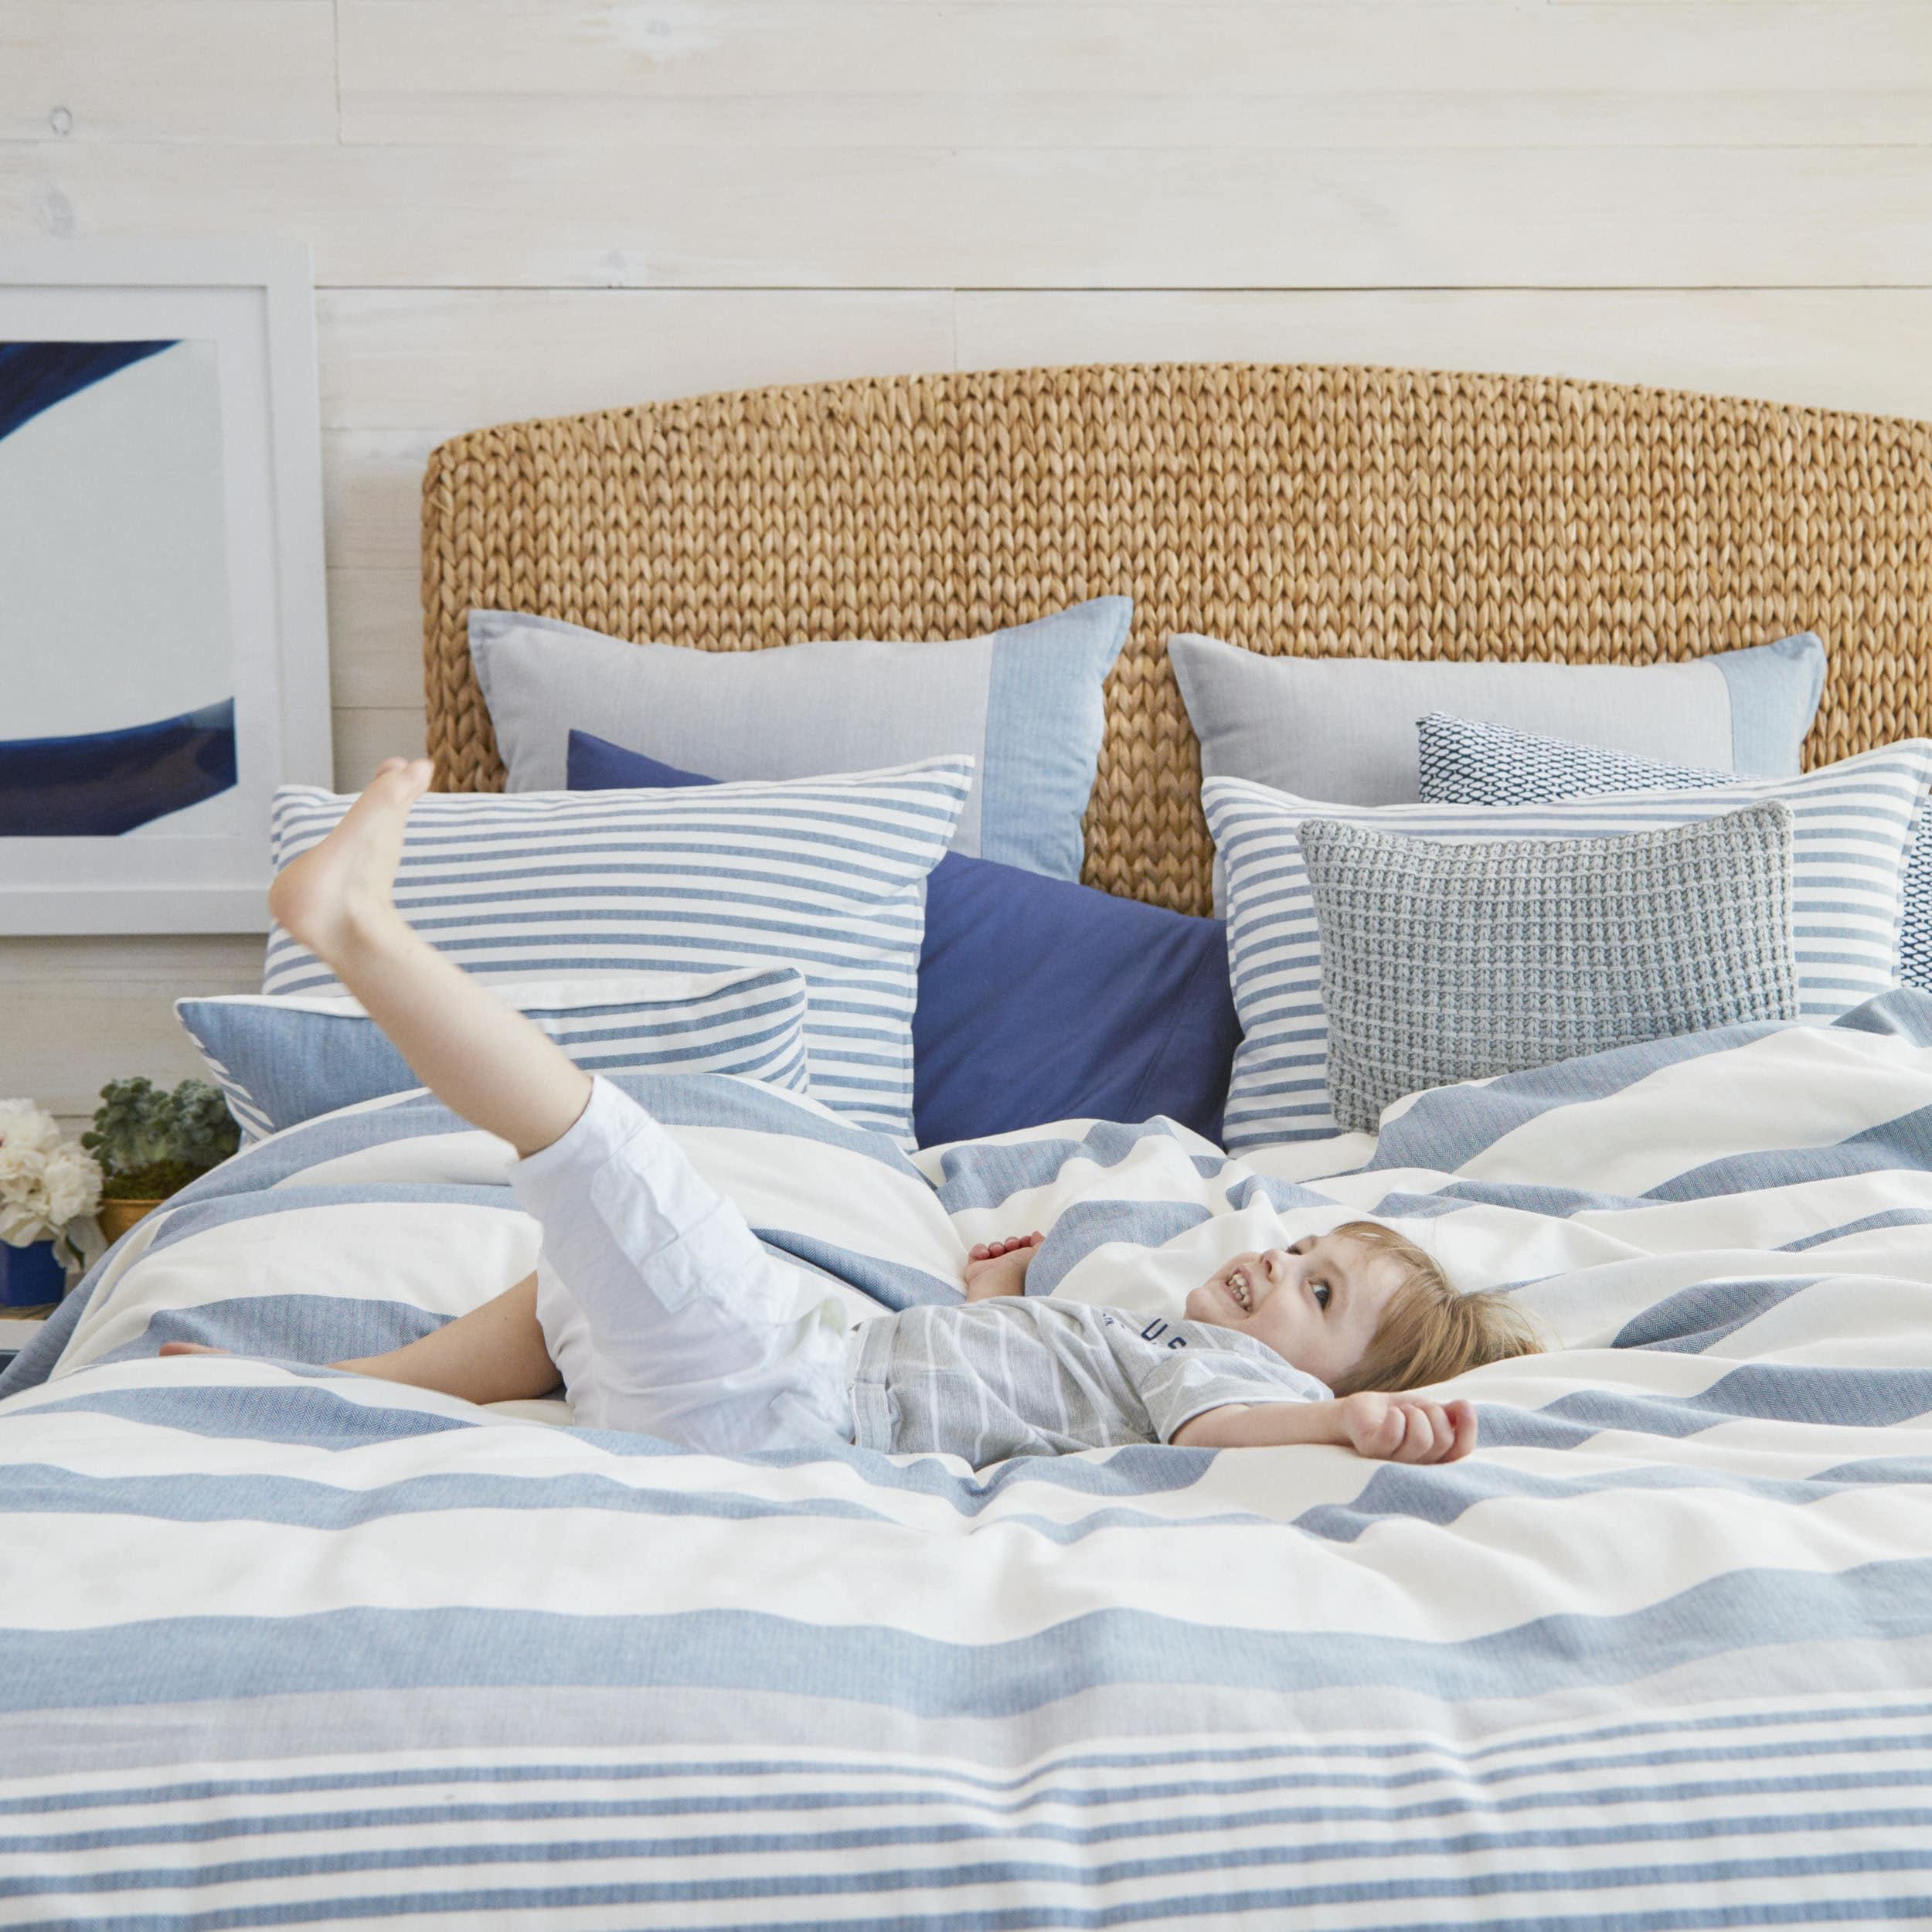 aetherair nautical sheet asli queen co elegant bedding set comforter nautica comforters